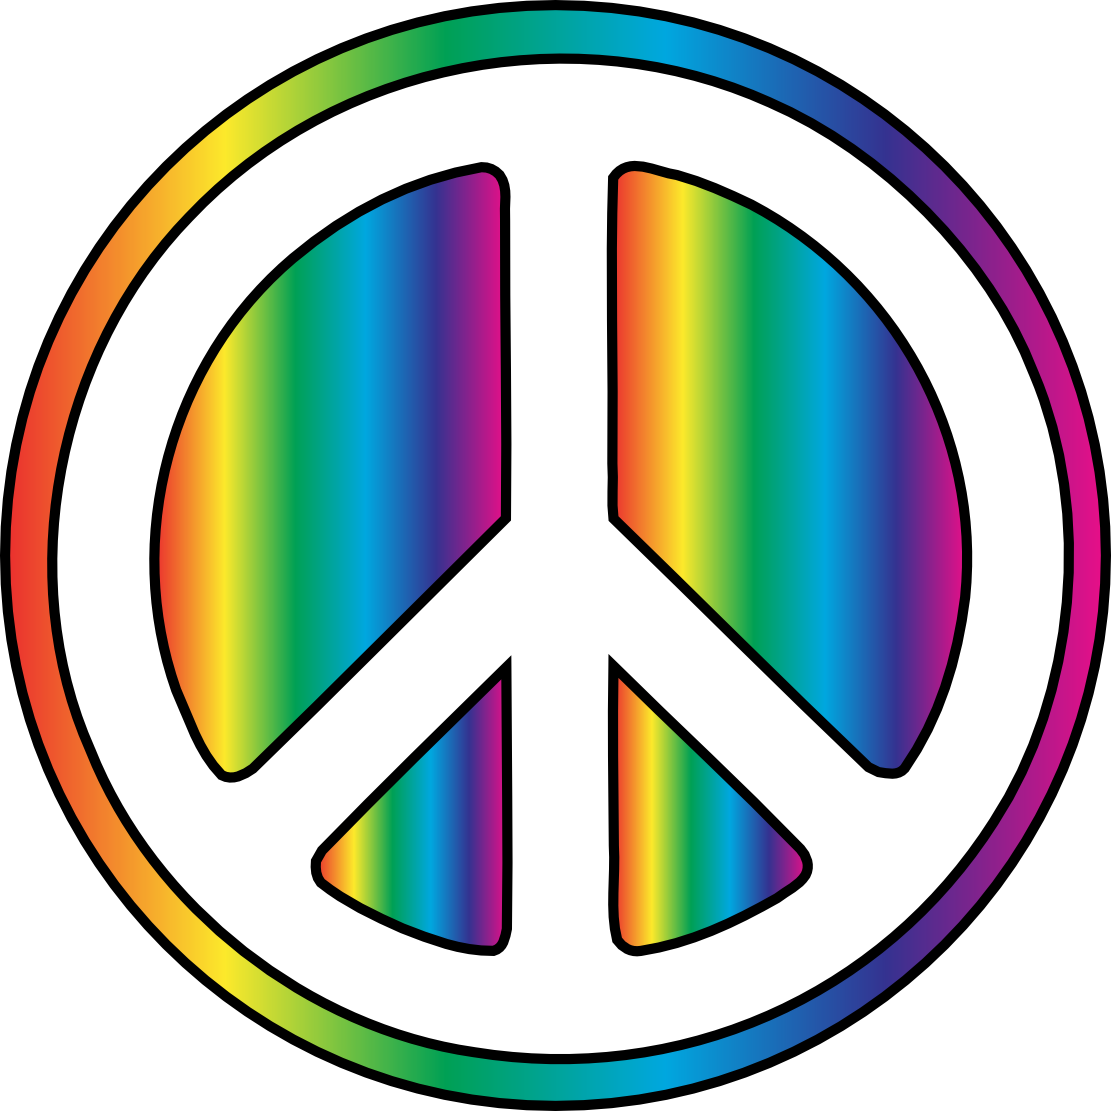 Hippie hd clipart - Hippie PNG HD